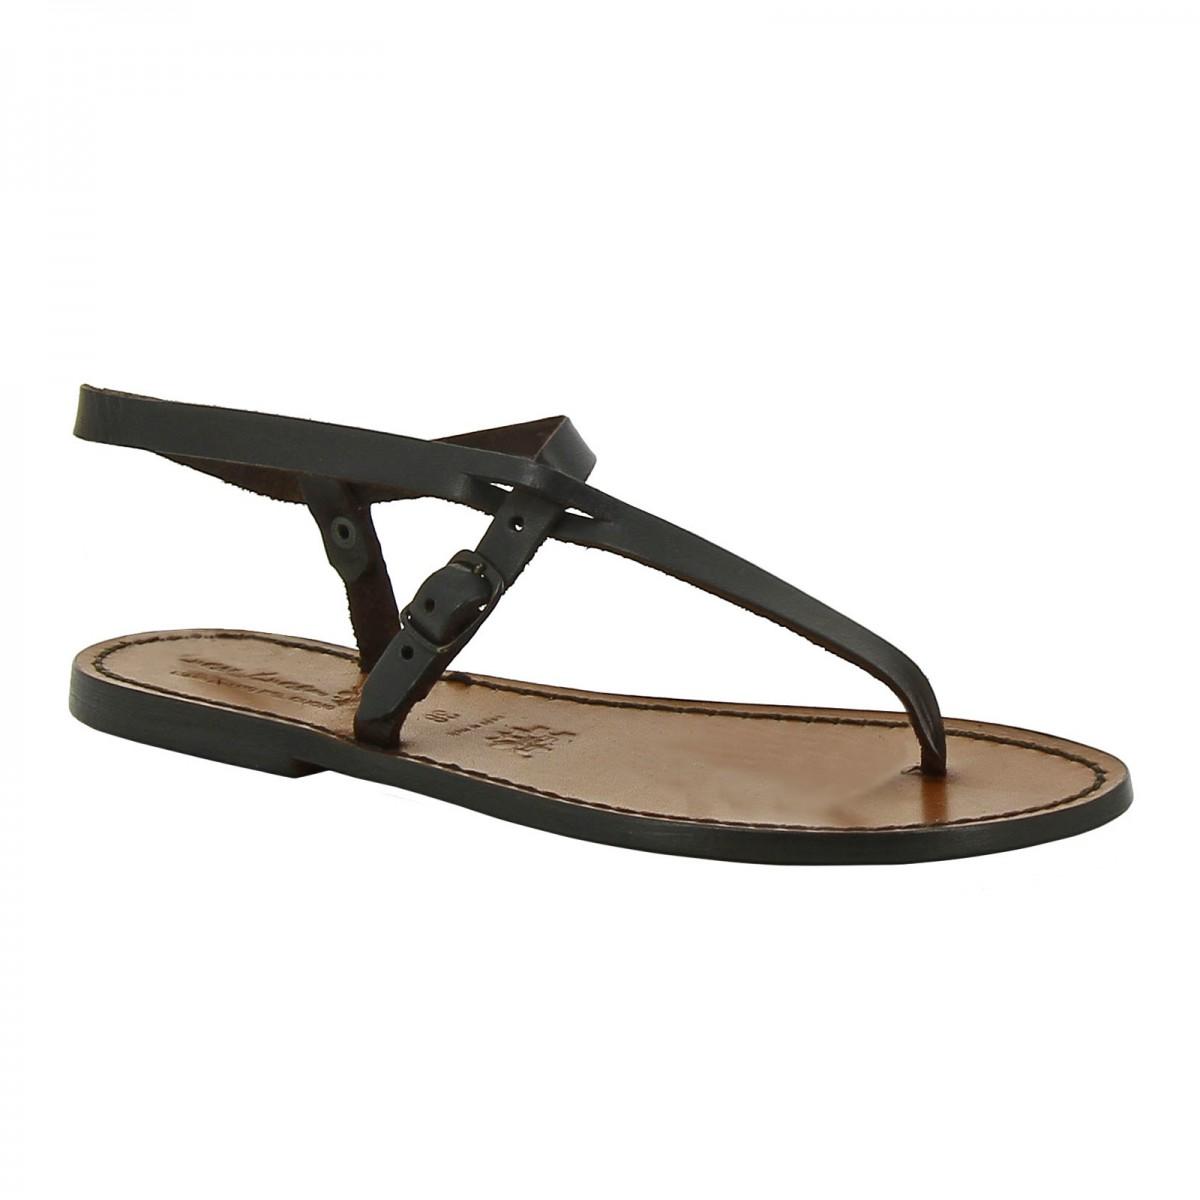 Chaussures - Sandales Gianluca L'artisan Du Cuir LnMnHrrbkq